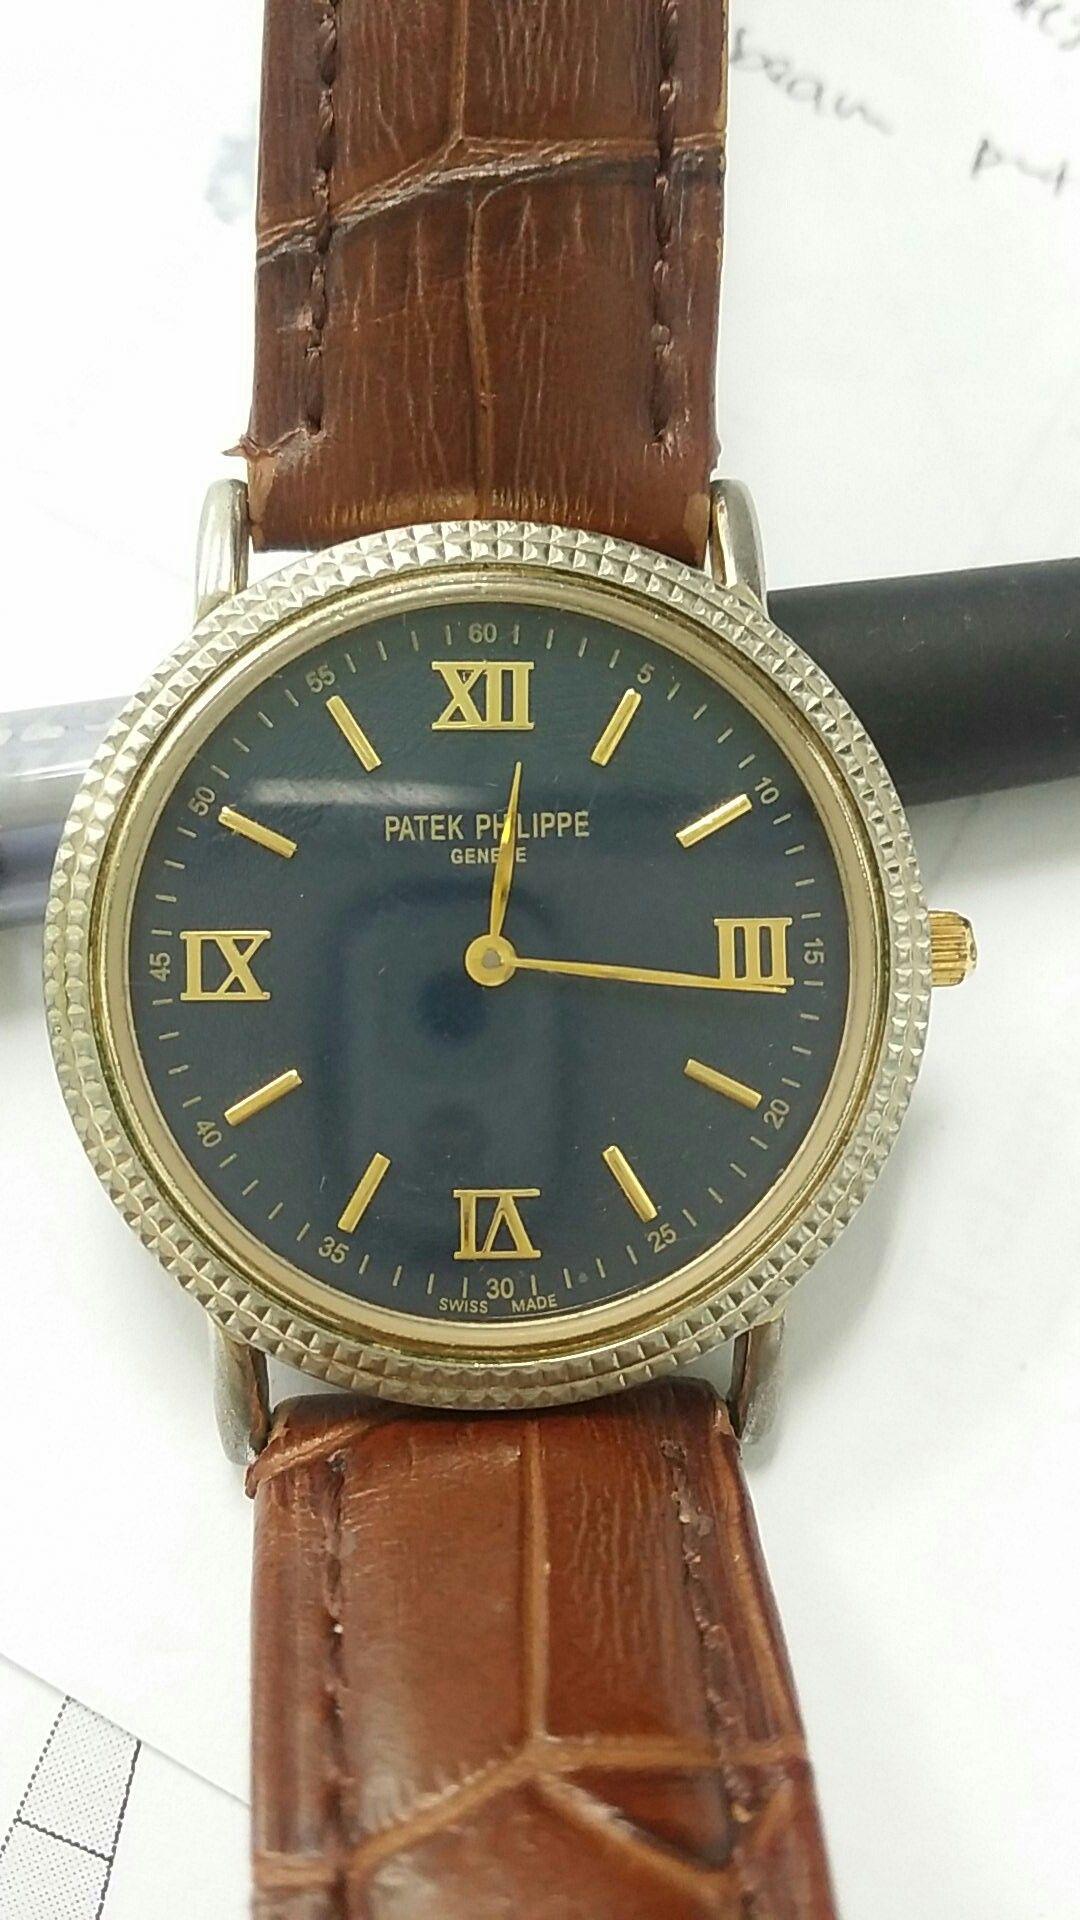 Patek Philippe Geneva Chronometer 15atm Patek Philippe Collection Geneva